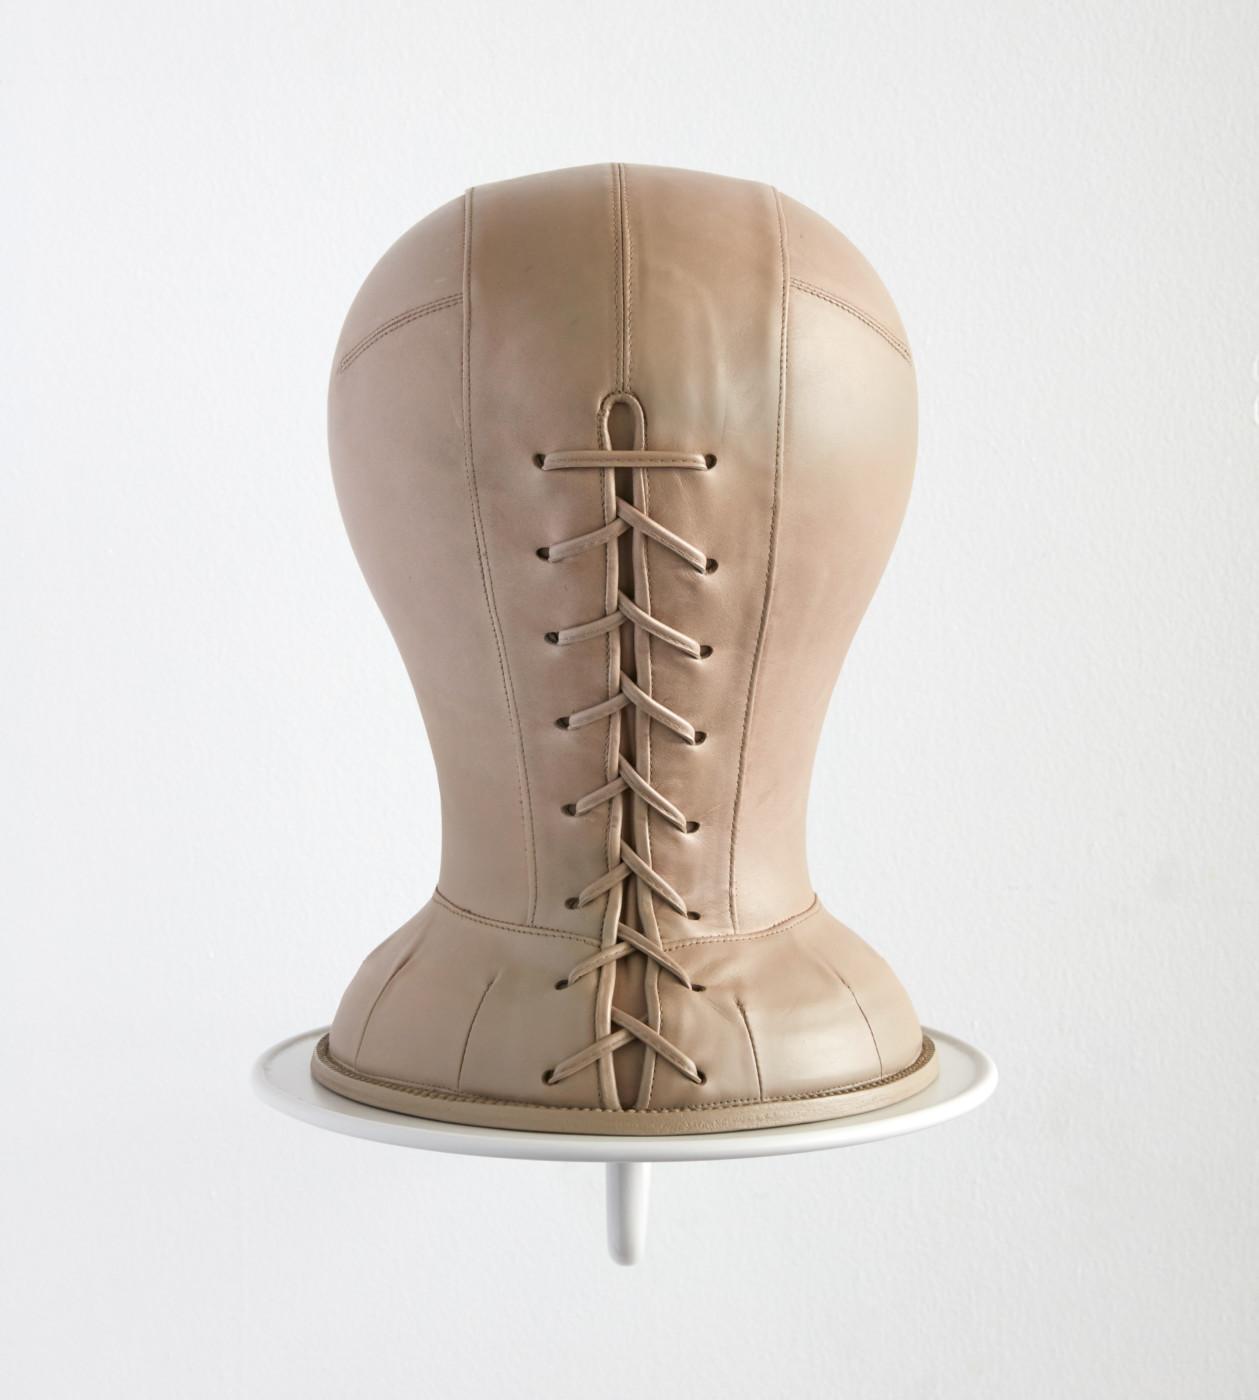 TÊTE  Tête fig. 1</I> (detail), 2019 Leather, wood, enamel, steel 43 x 25 x 53 cm / 16 7/8 x 9 7/8 x 20 7/8 in  ORION MARTIN